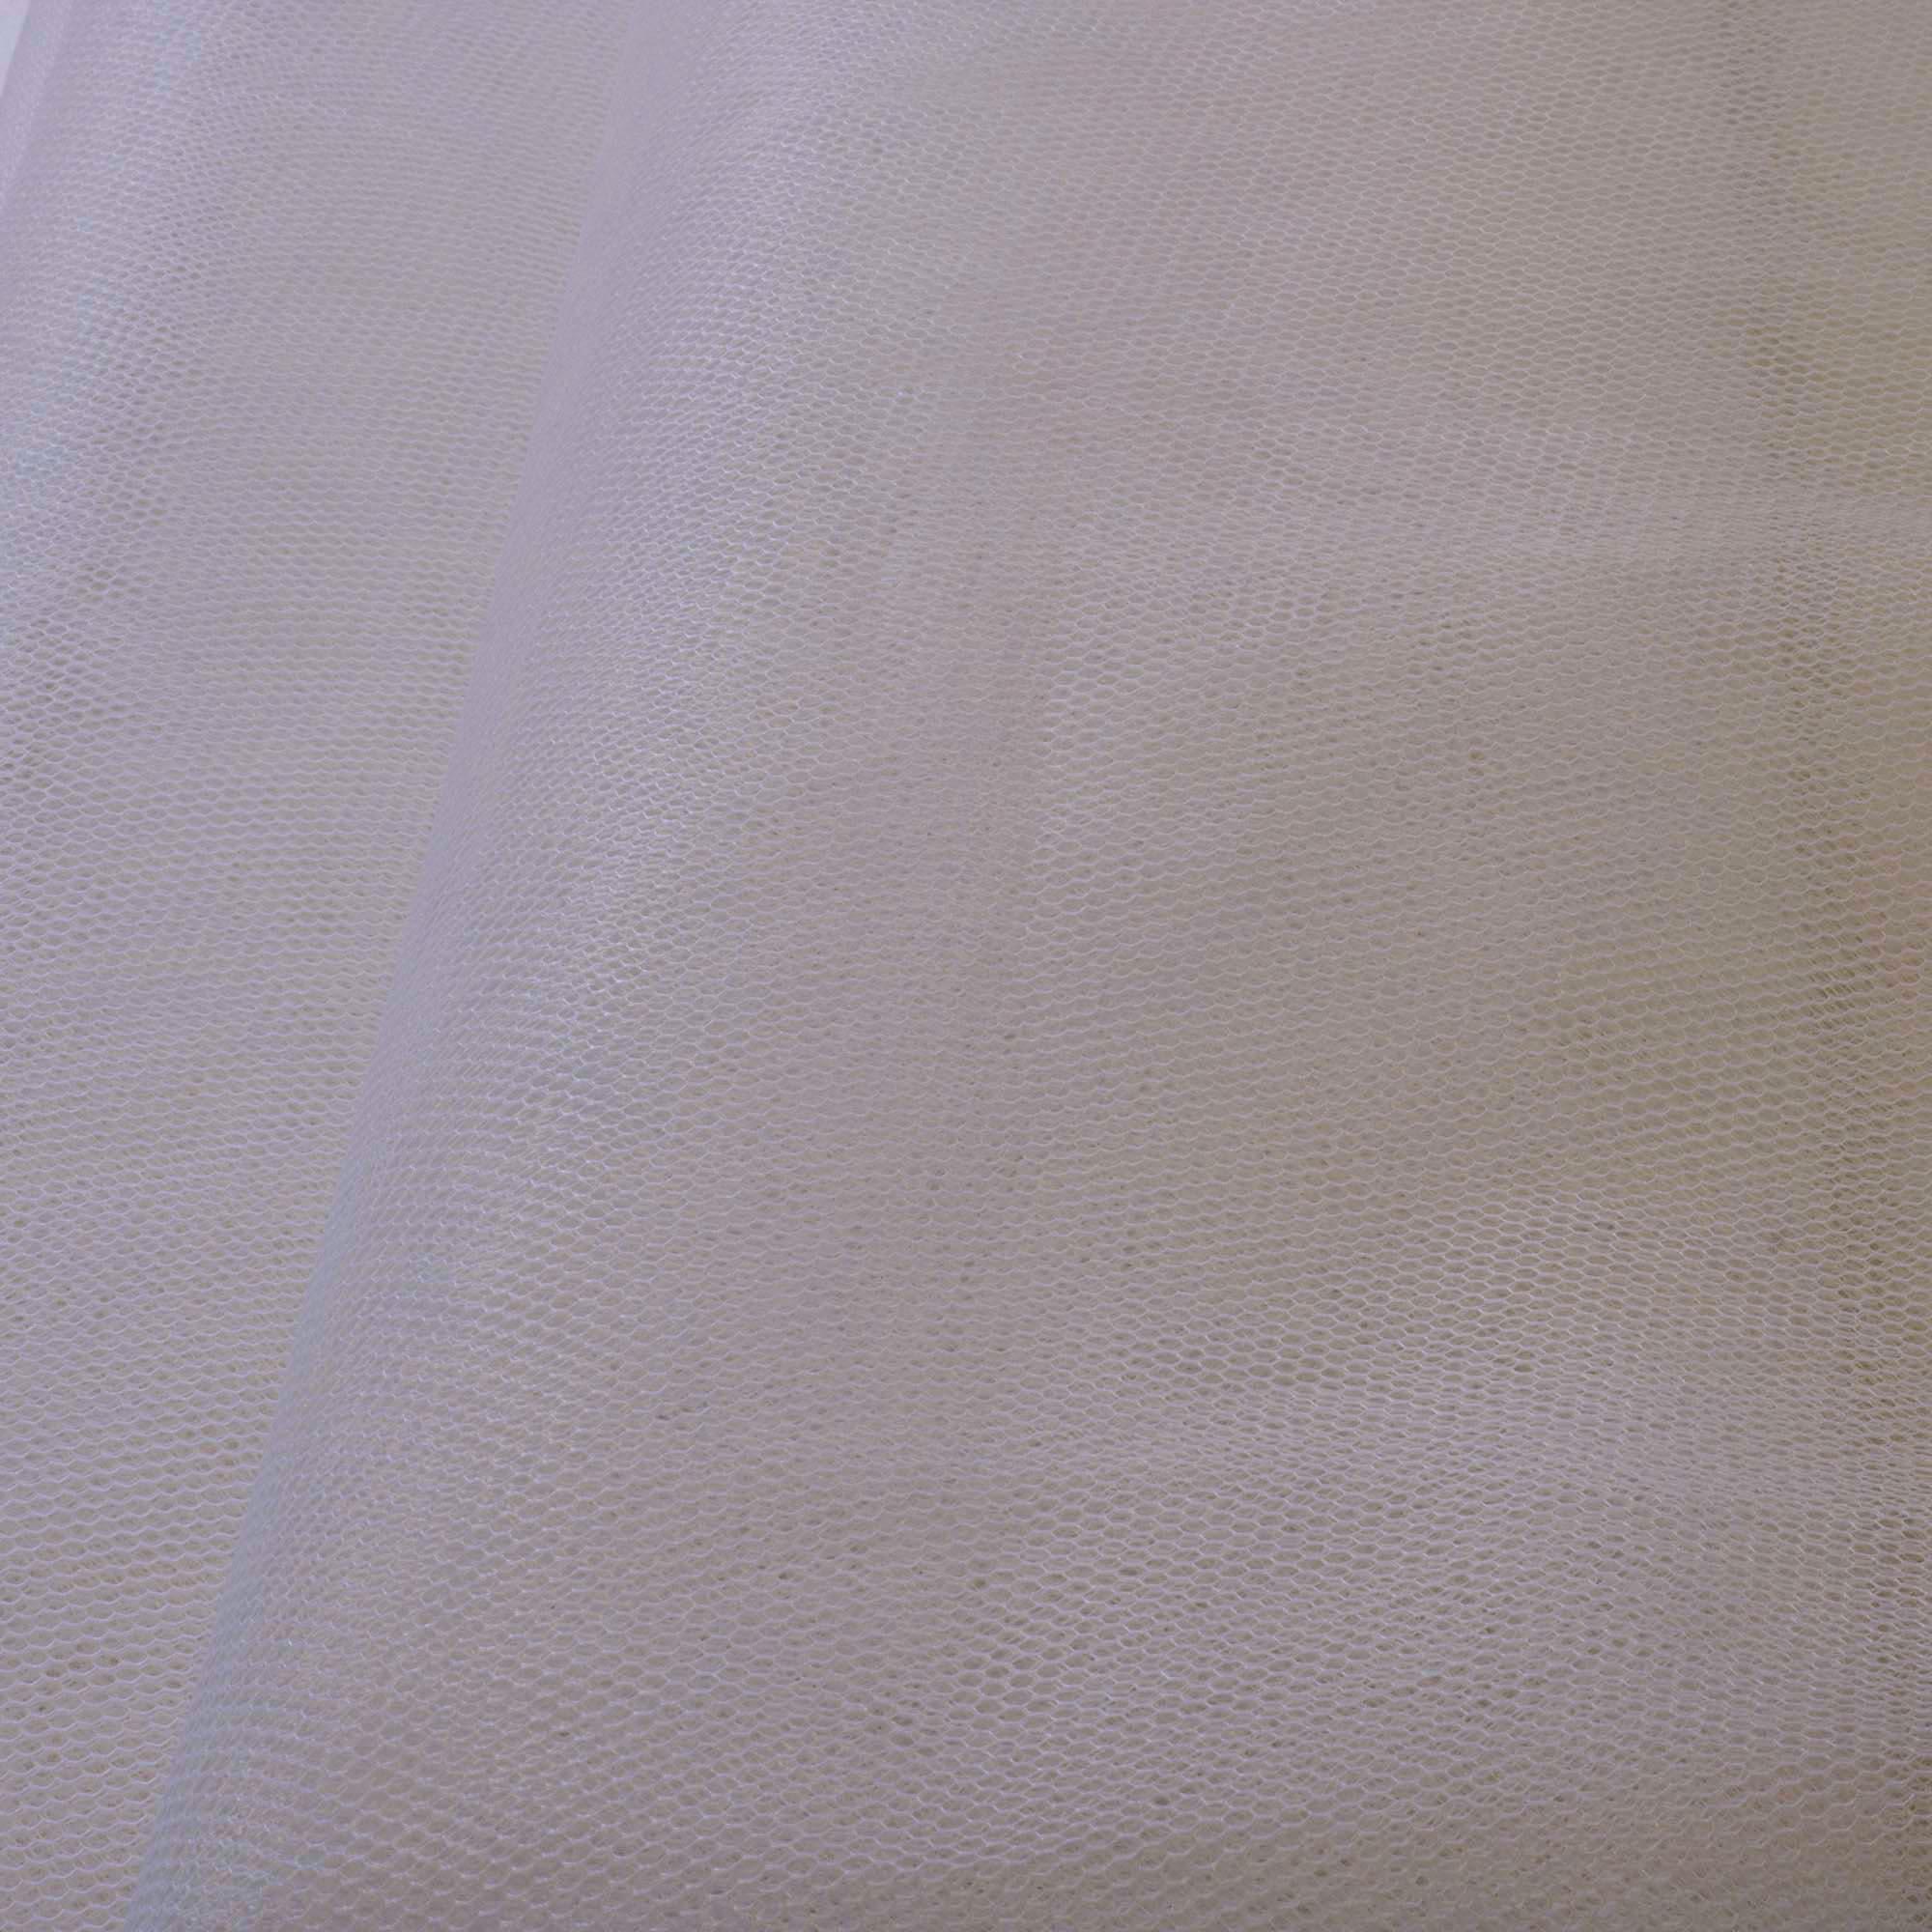 Tecido Filó Branco 100% Poliamida 3 m Largura